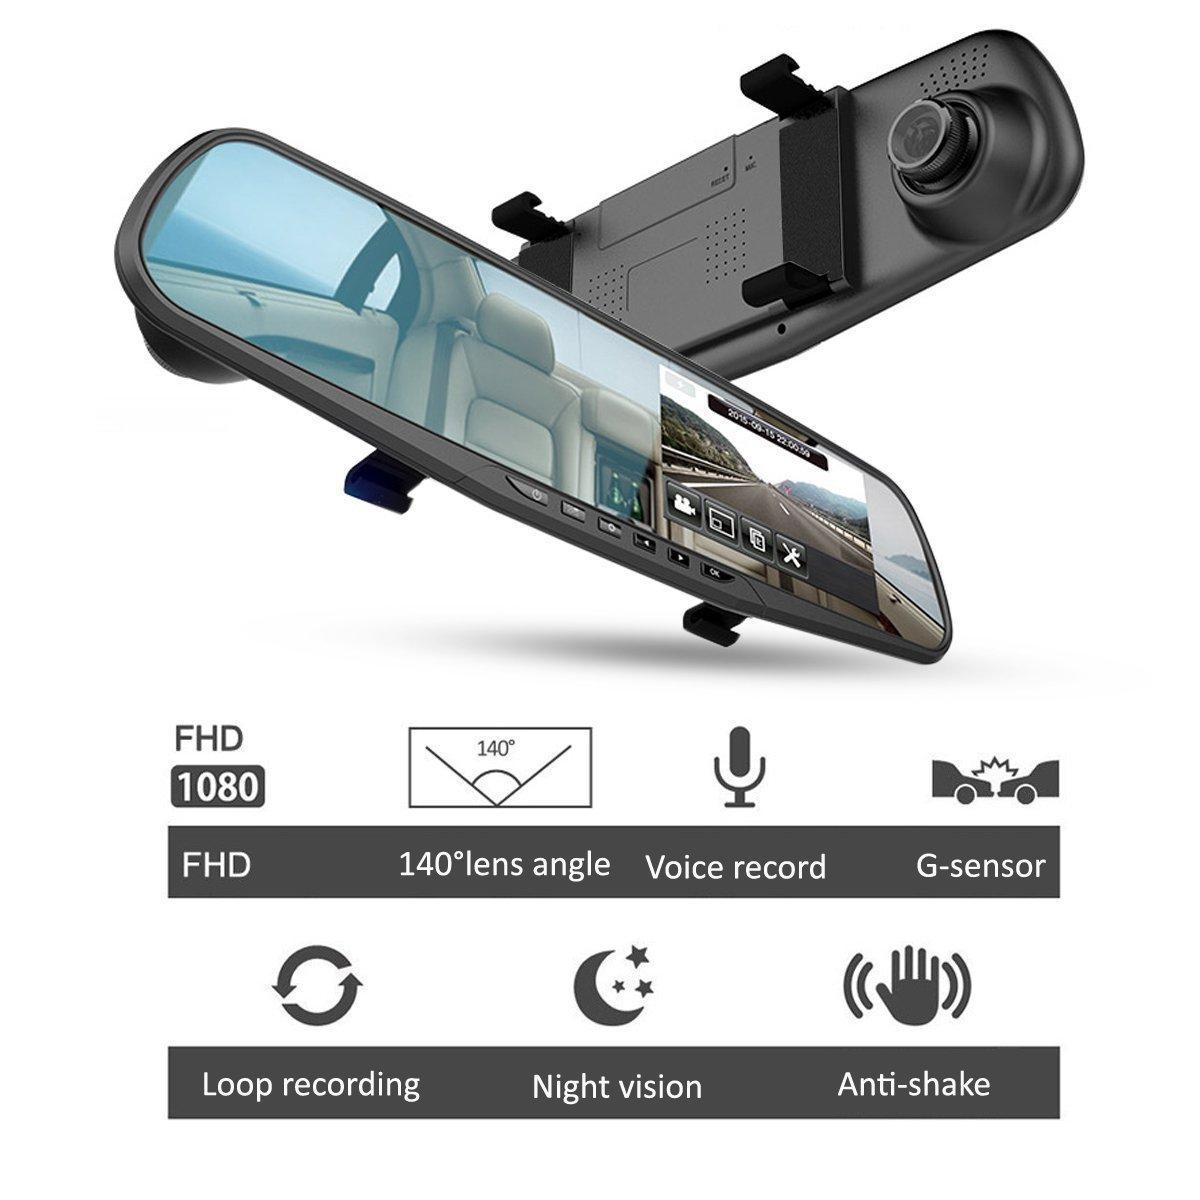 Amazon.com: Camara Para Carro Espejo Retrovisor + Camara Trasera Para Carro Seguridad Con Detector Movimiento Vision Noche Card SD 16G: Car Electronics